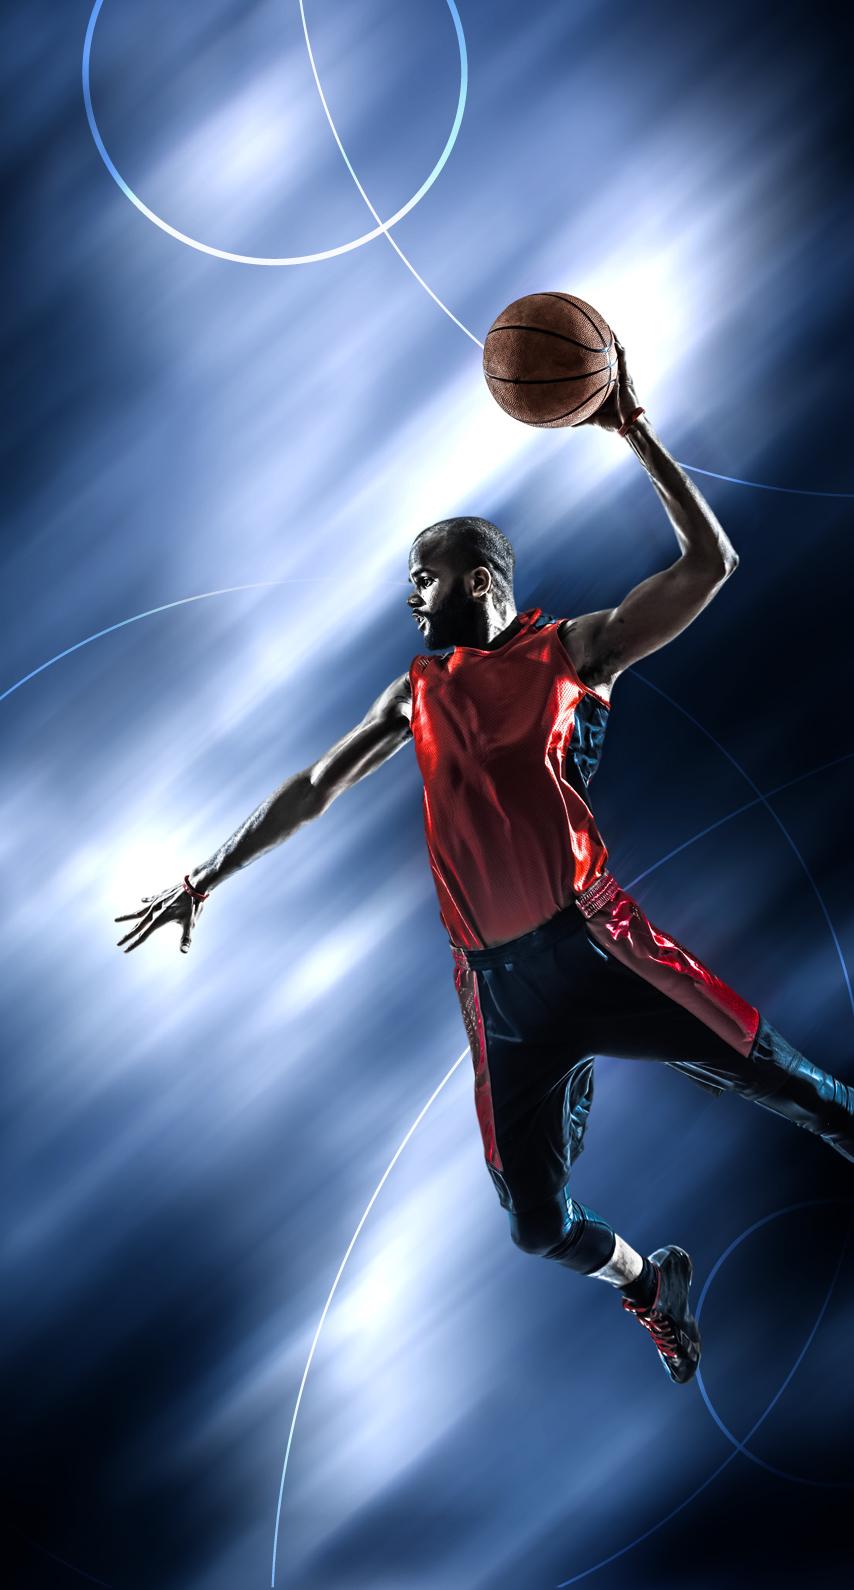 ball, motion